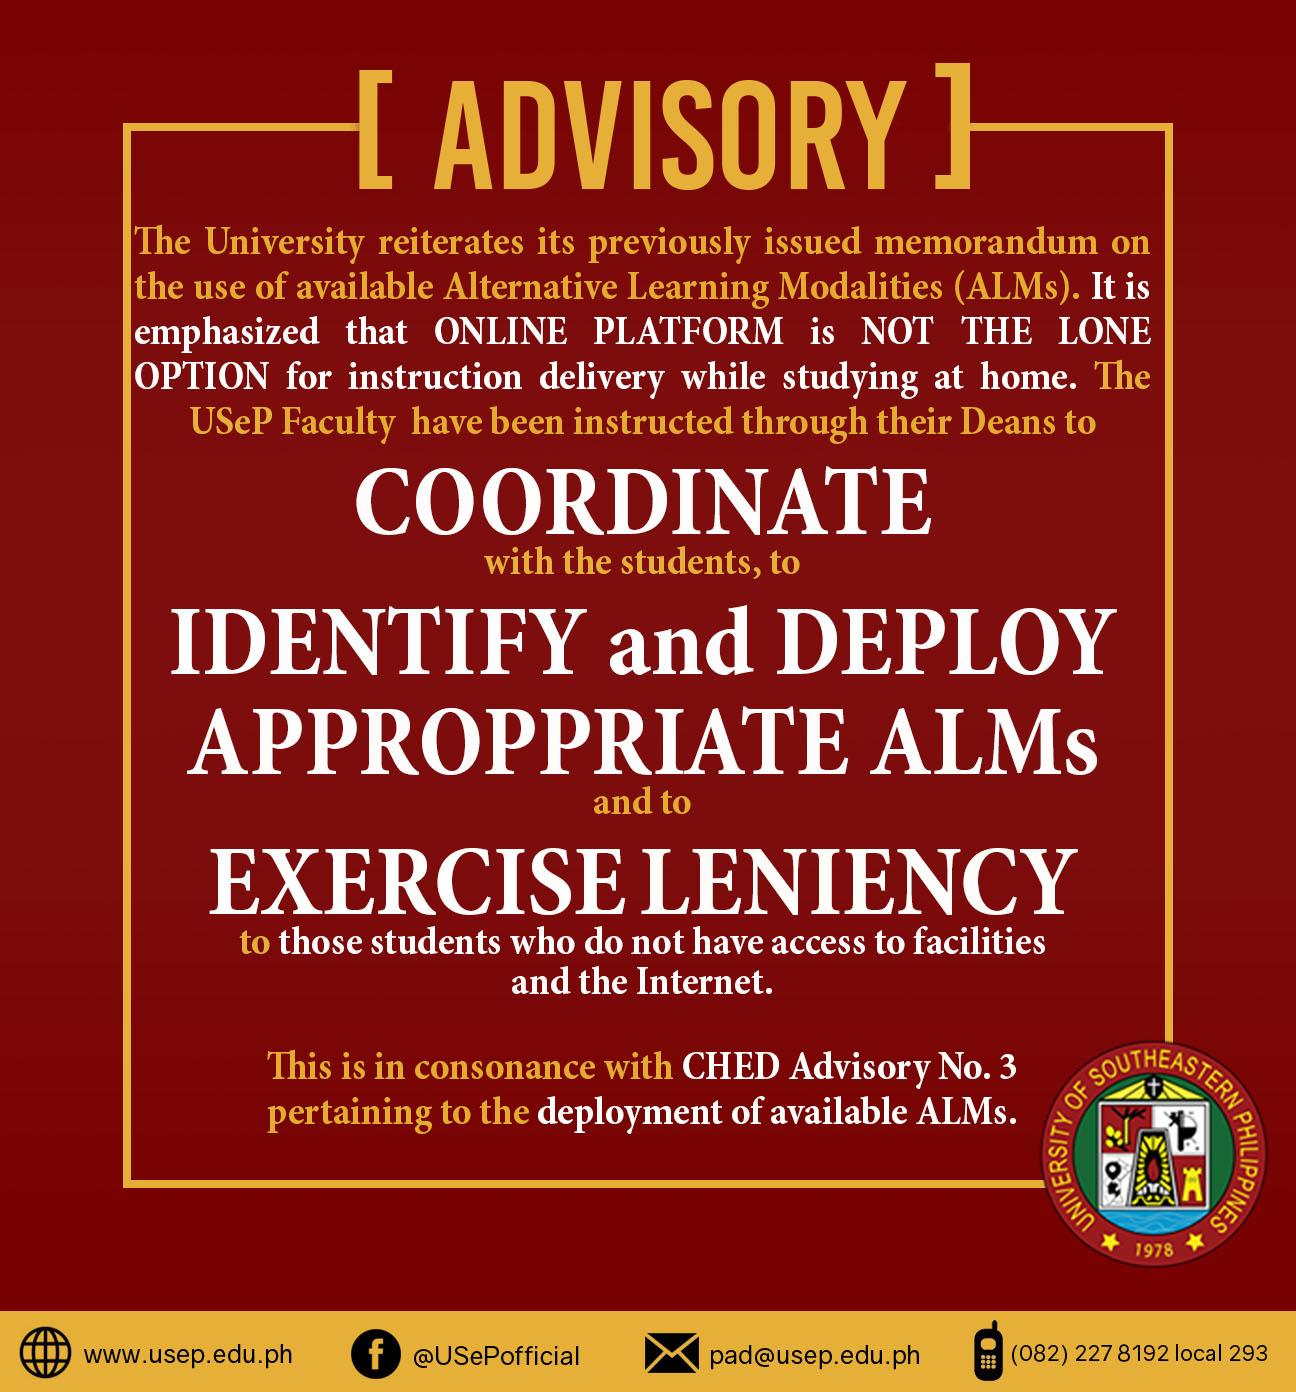 advisory-fof-alms-2